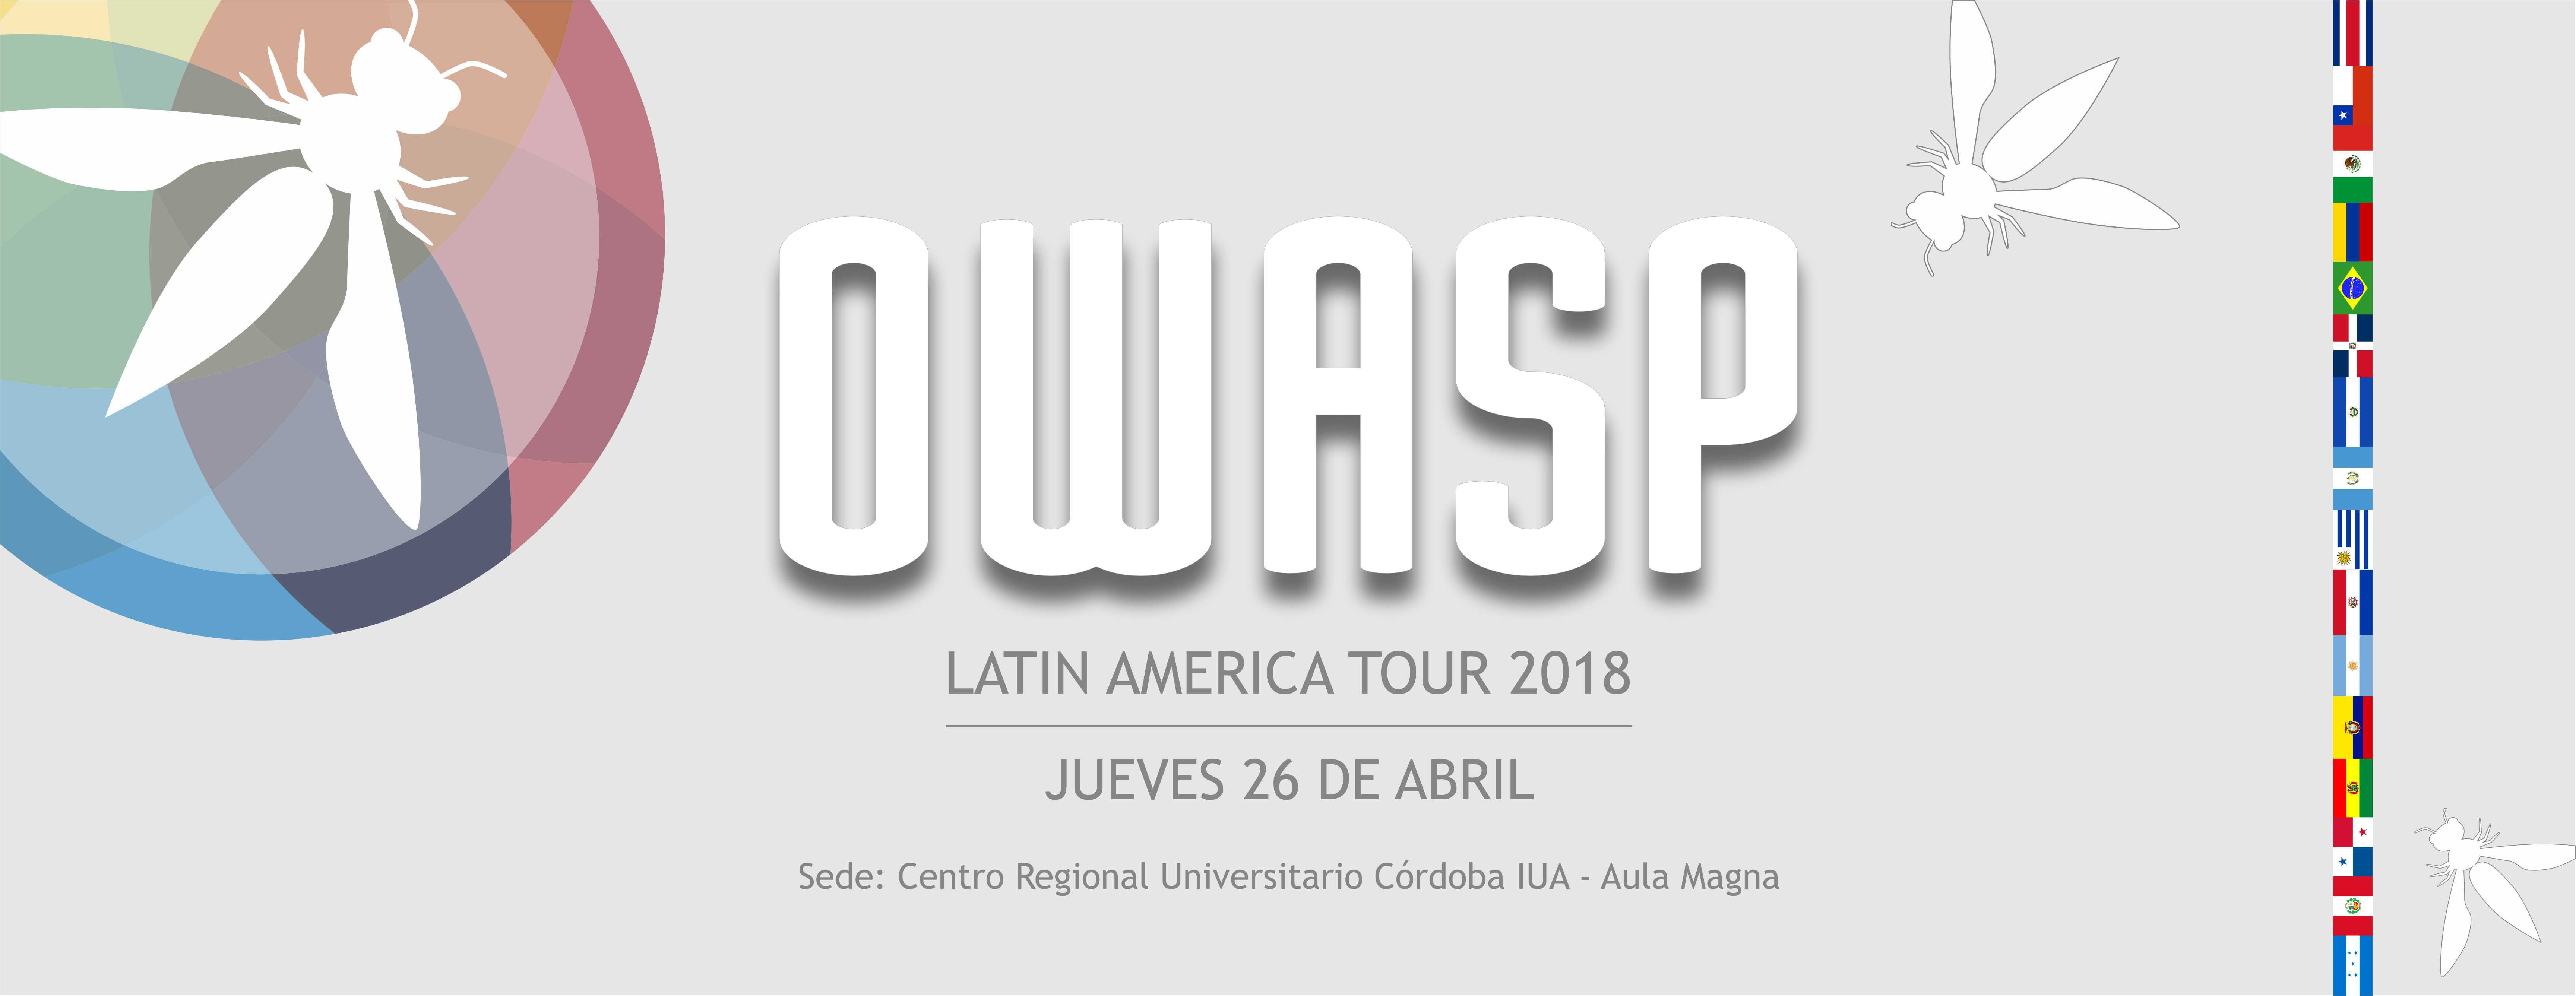 OWASP Latin American Tour 2018 – Jueves 26 de abril